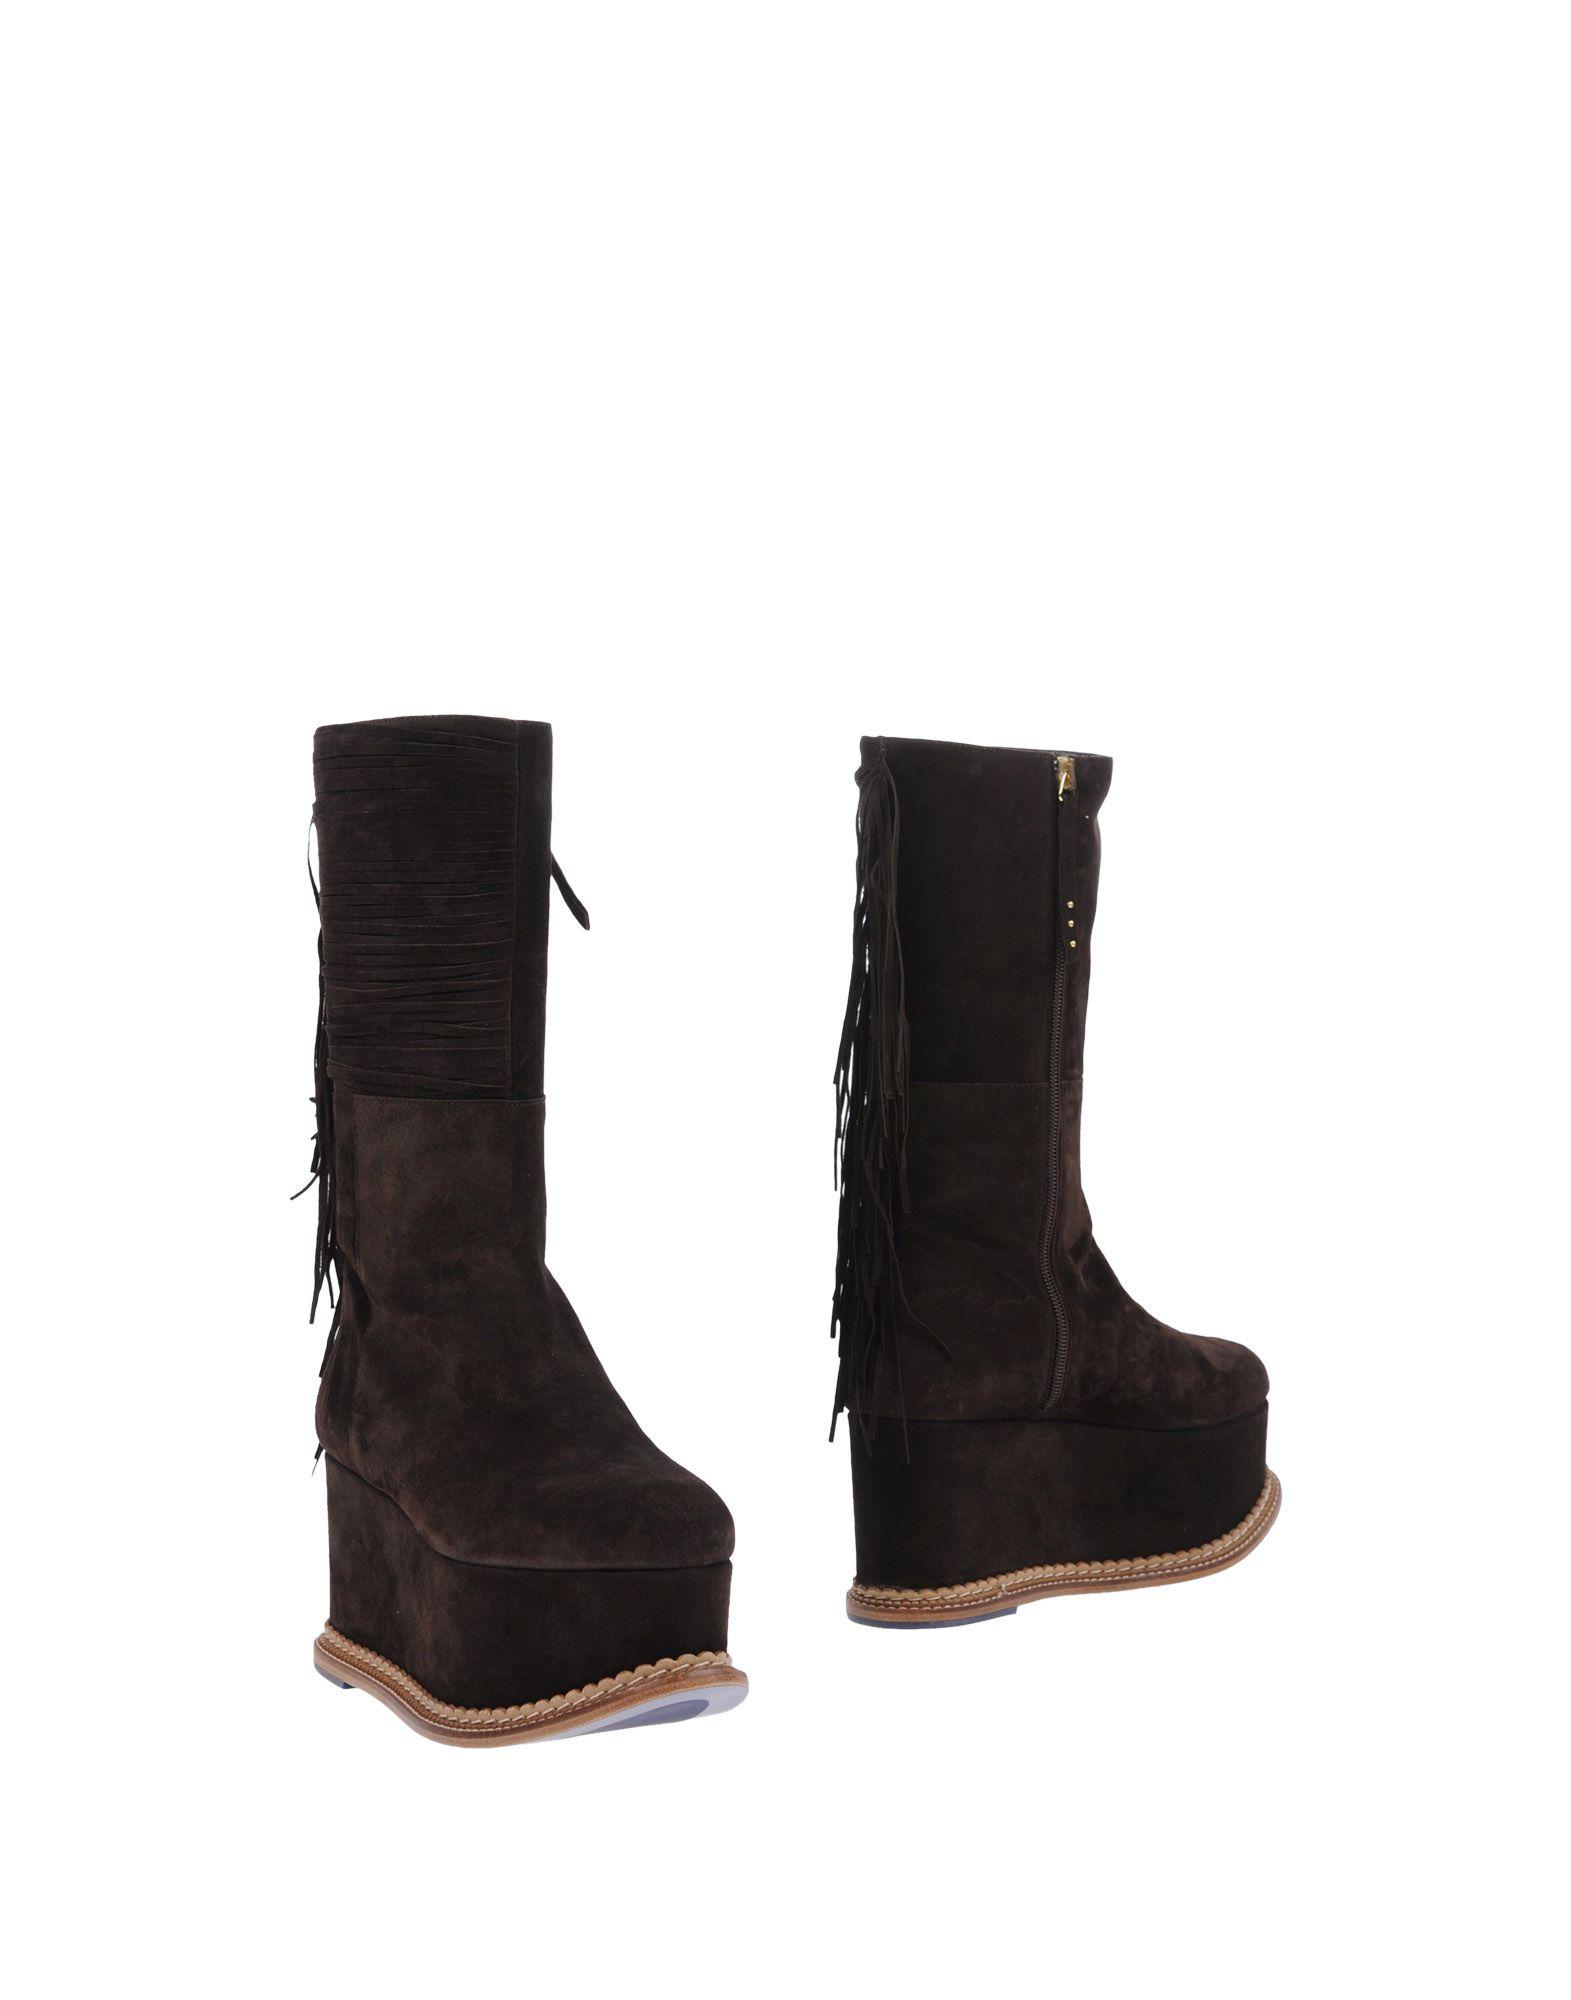 Gut um billige Schuhe zu tragenPaloma Barceló Stiefel Damen   Damen 11225408KT 678f7b